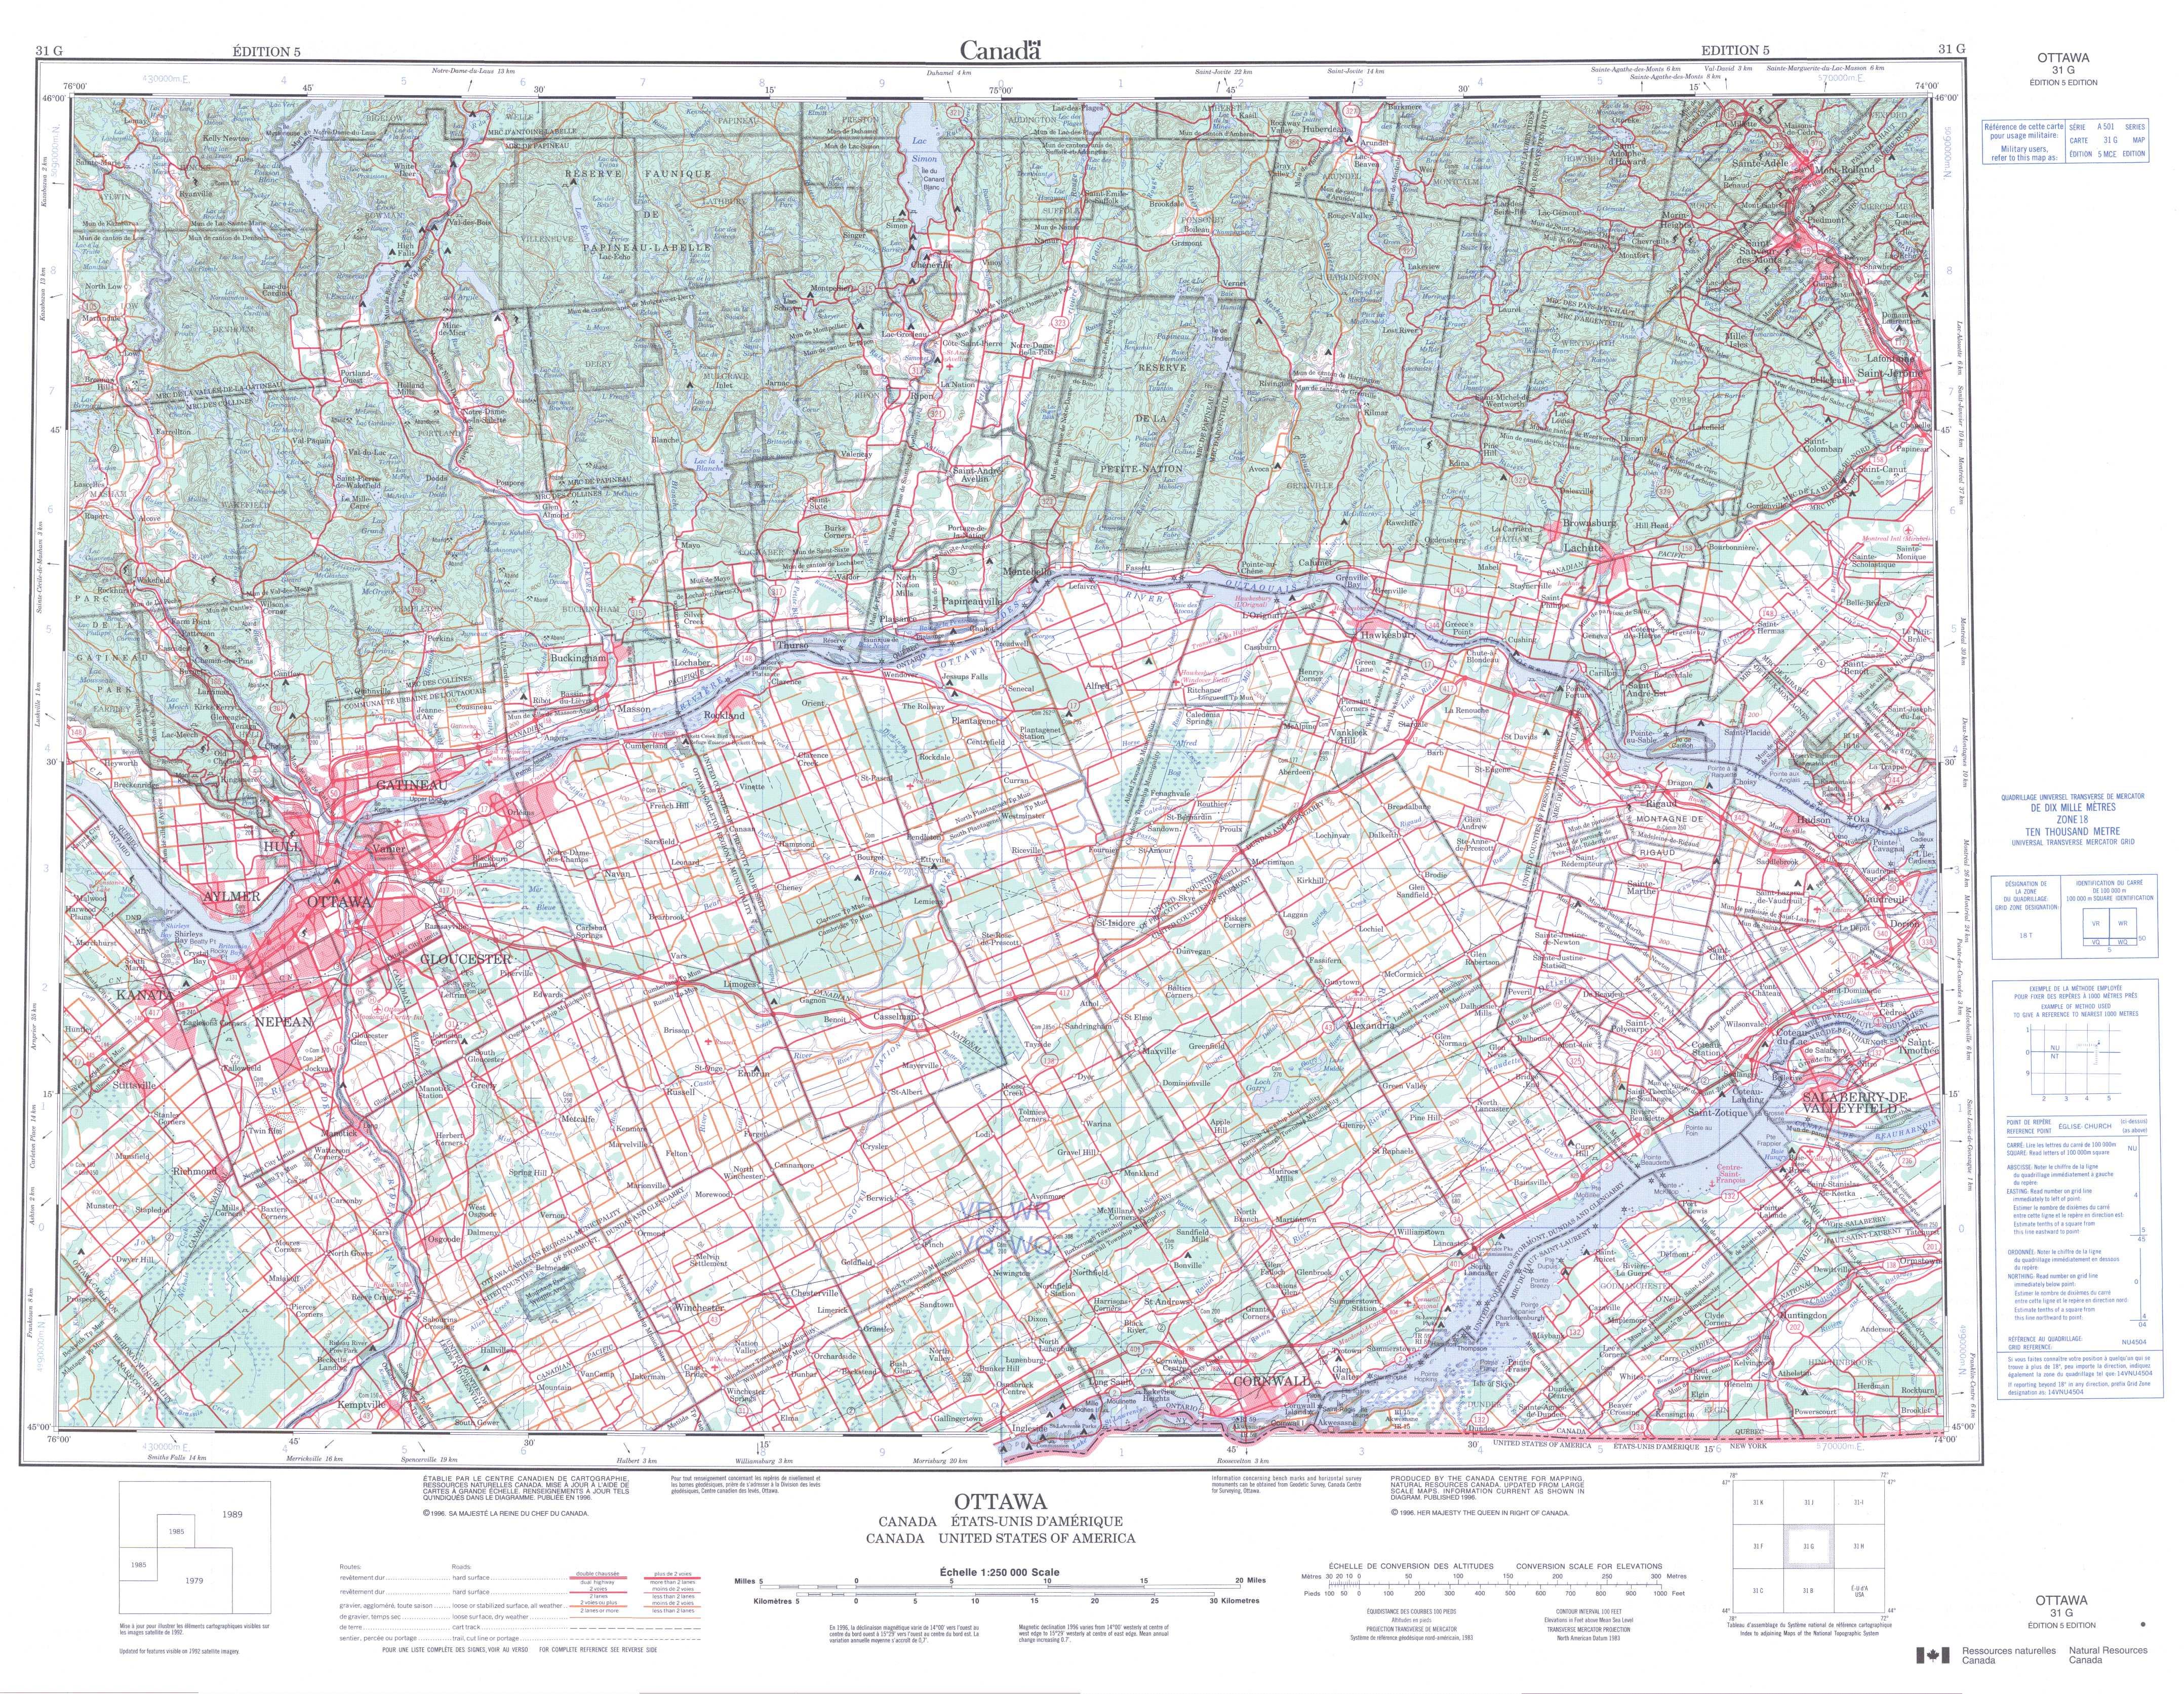 Printable Topographic Map Of Ottawa 031G, On - Printable Topo Maps Online